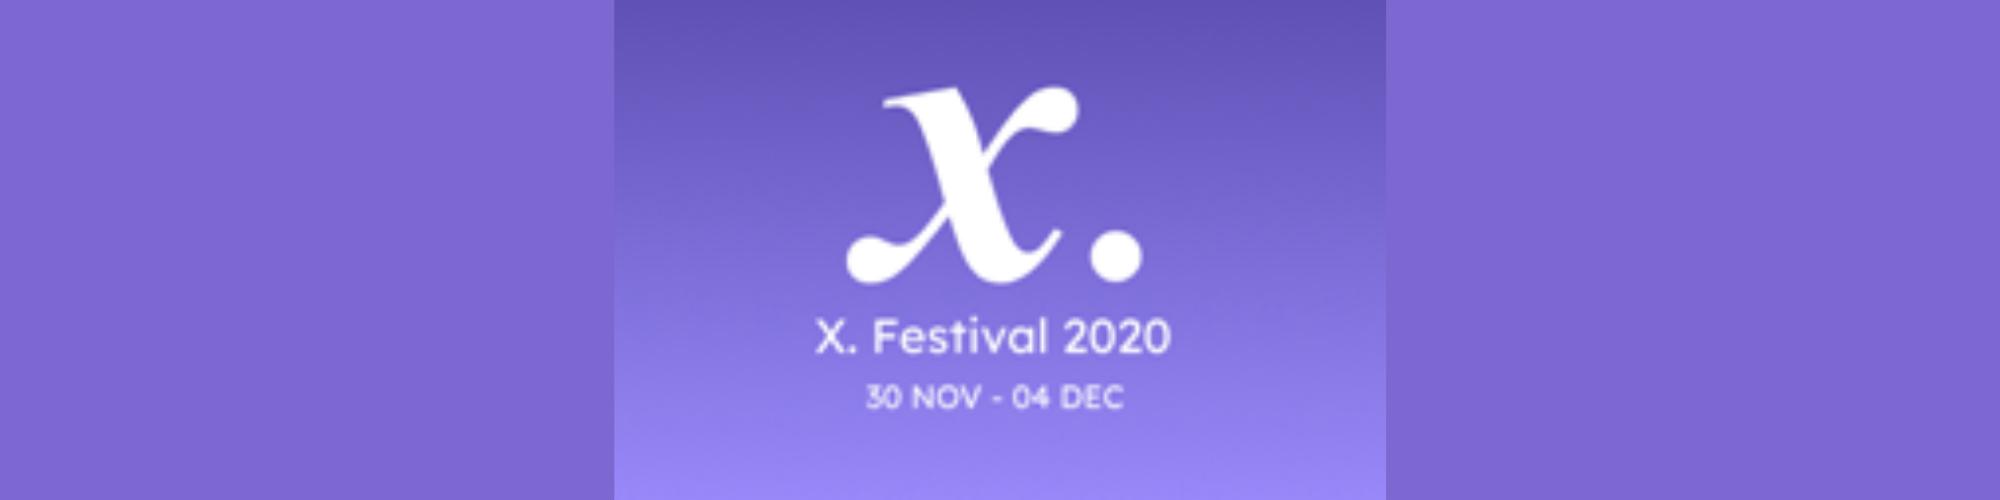 Gratis inspiratieweek op X.Festival 2020